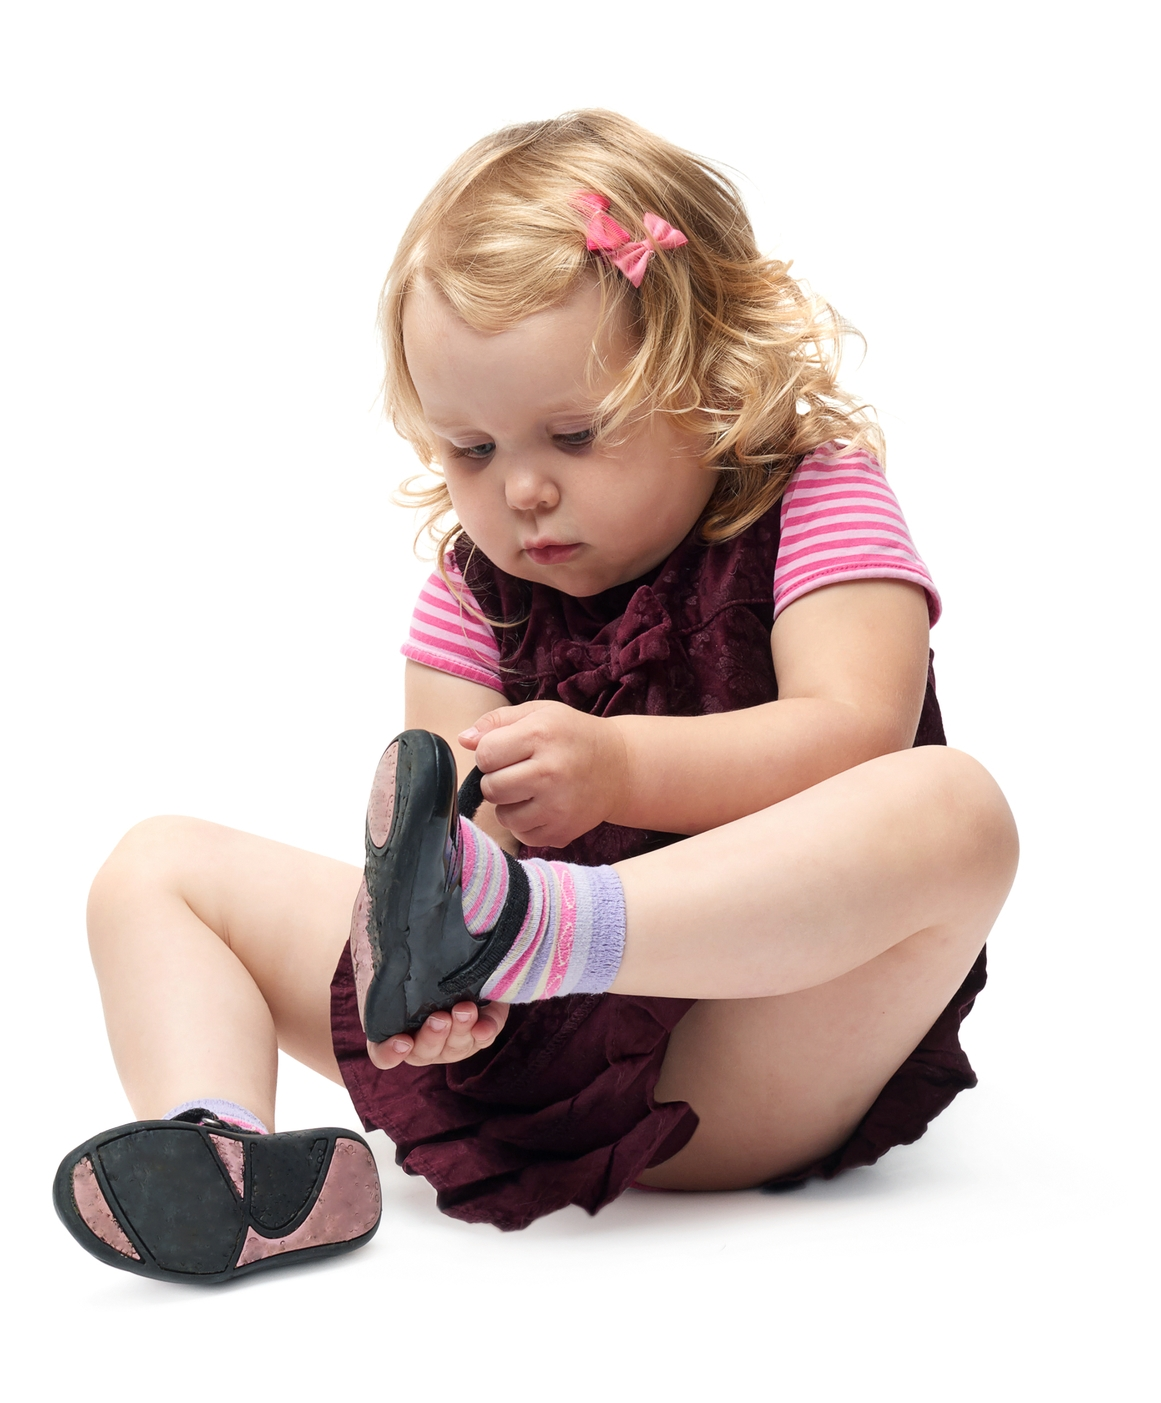 girlp putting on shoe.jpg